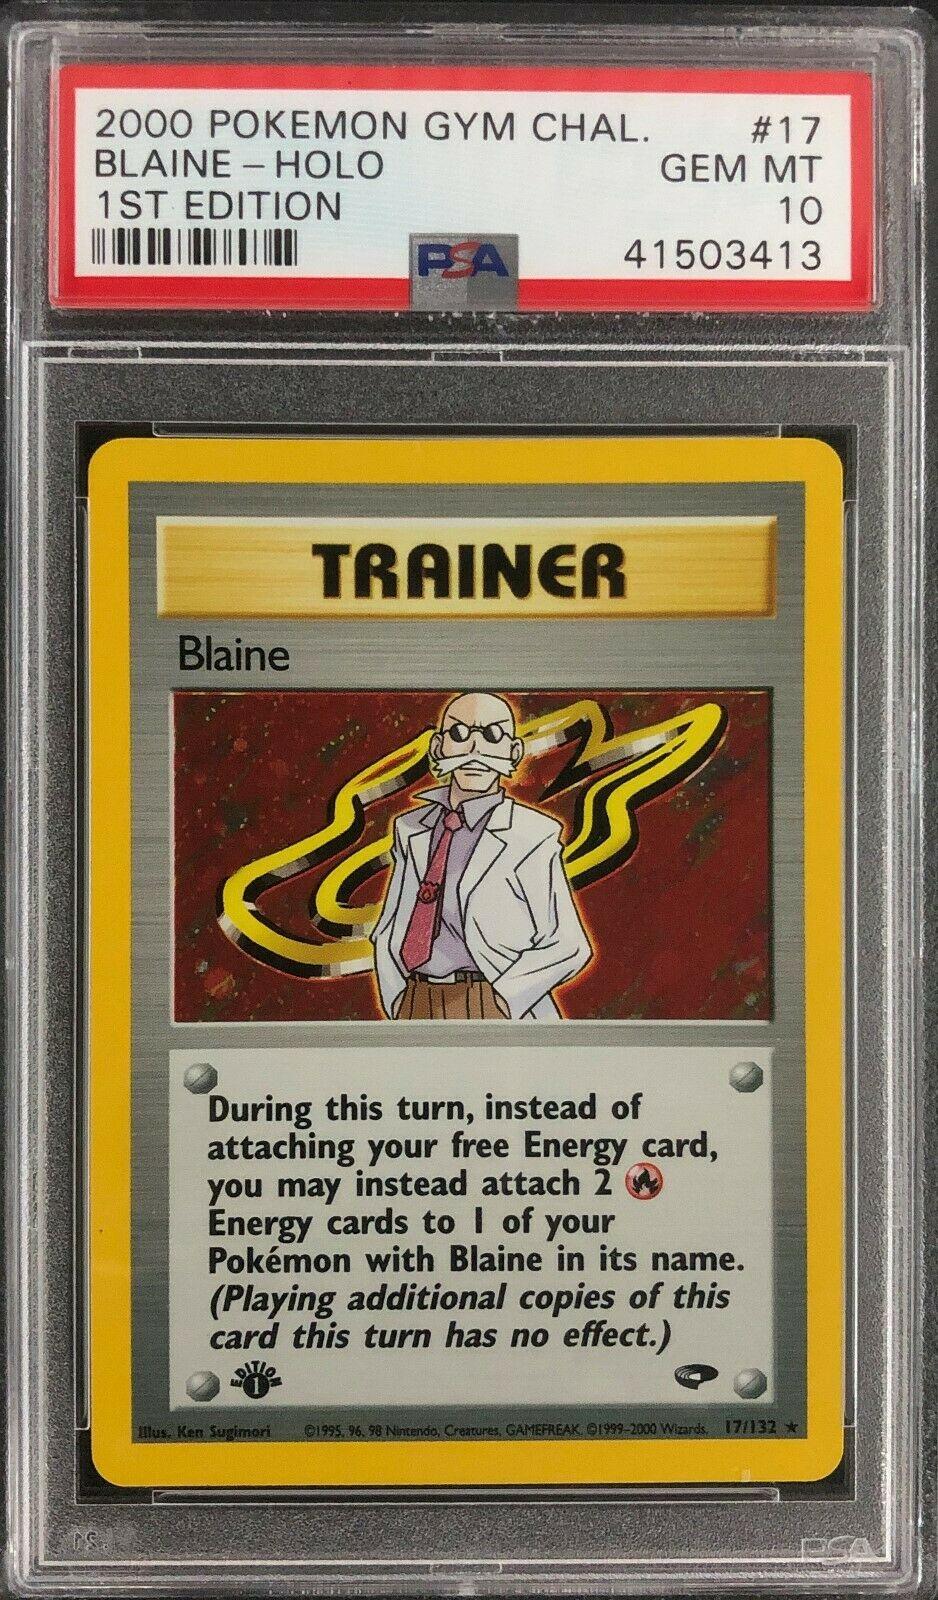 1st Edition Gym Challenge Blaine Holo Pokemon Card Mint PSA 10